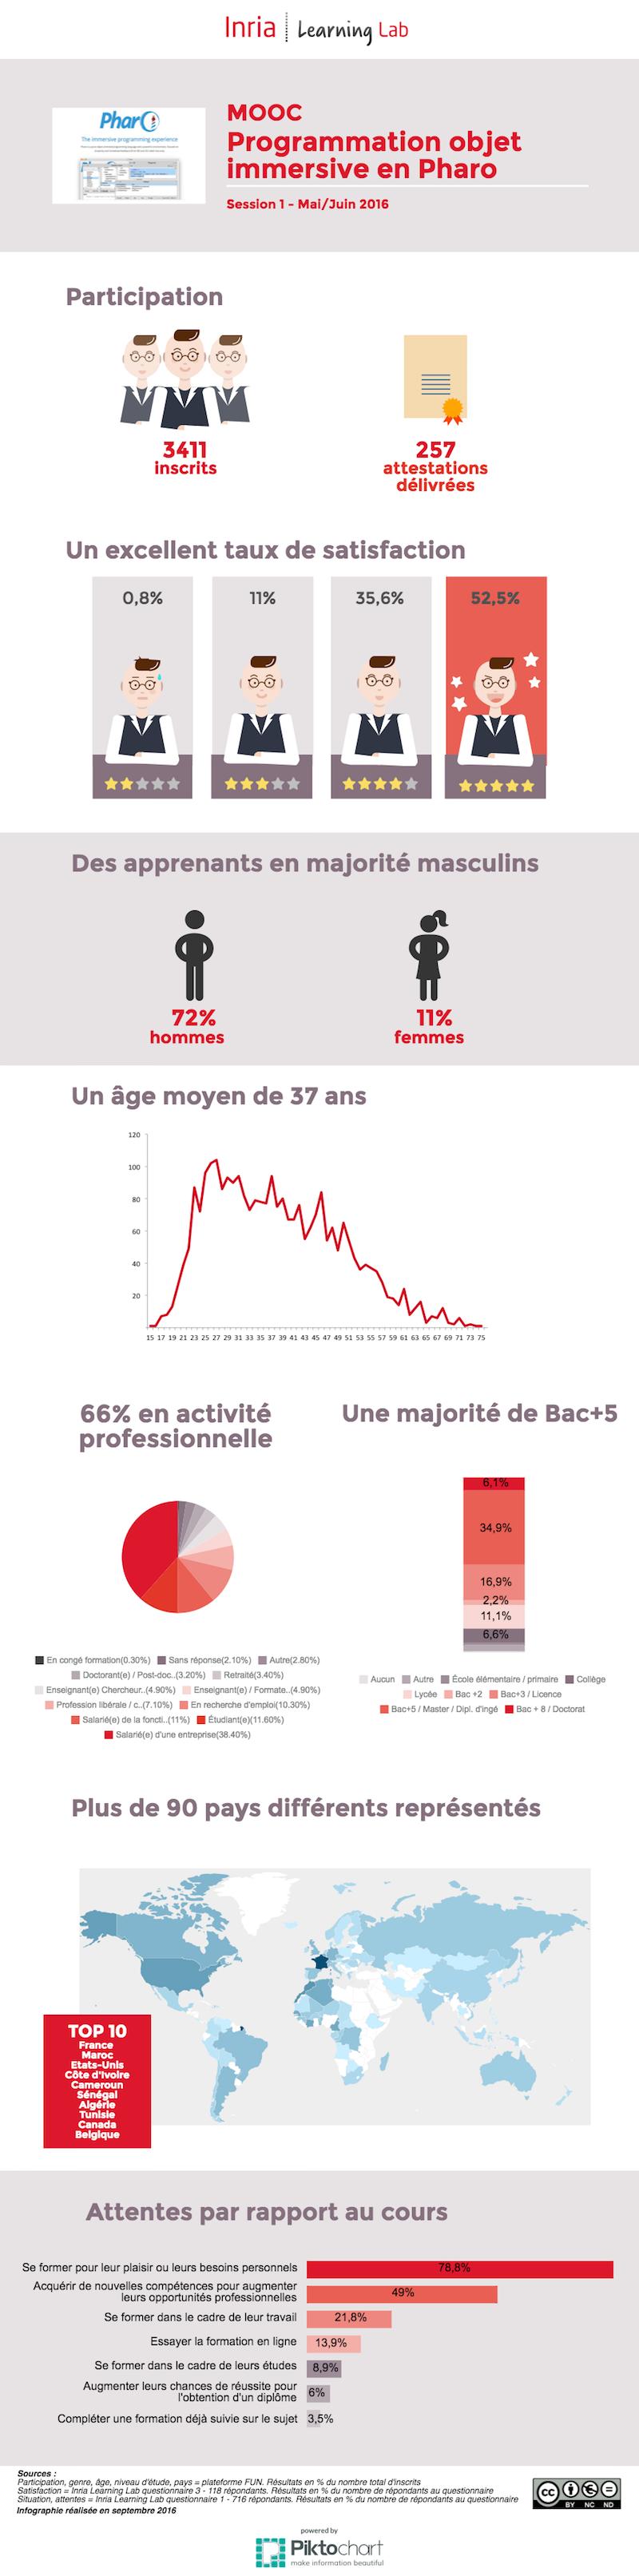 Infographie - MOOC Pharo